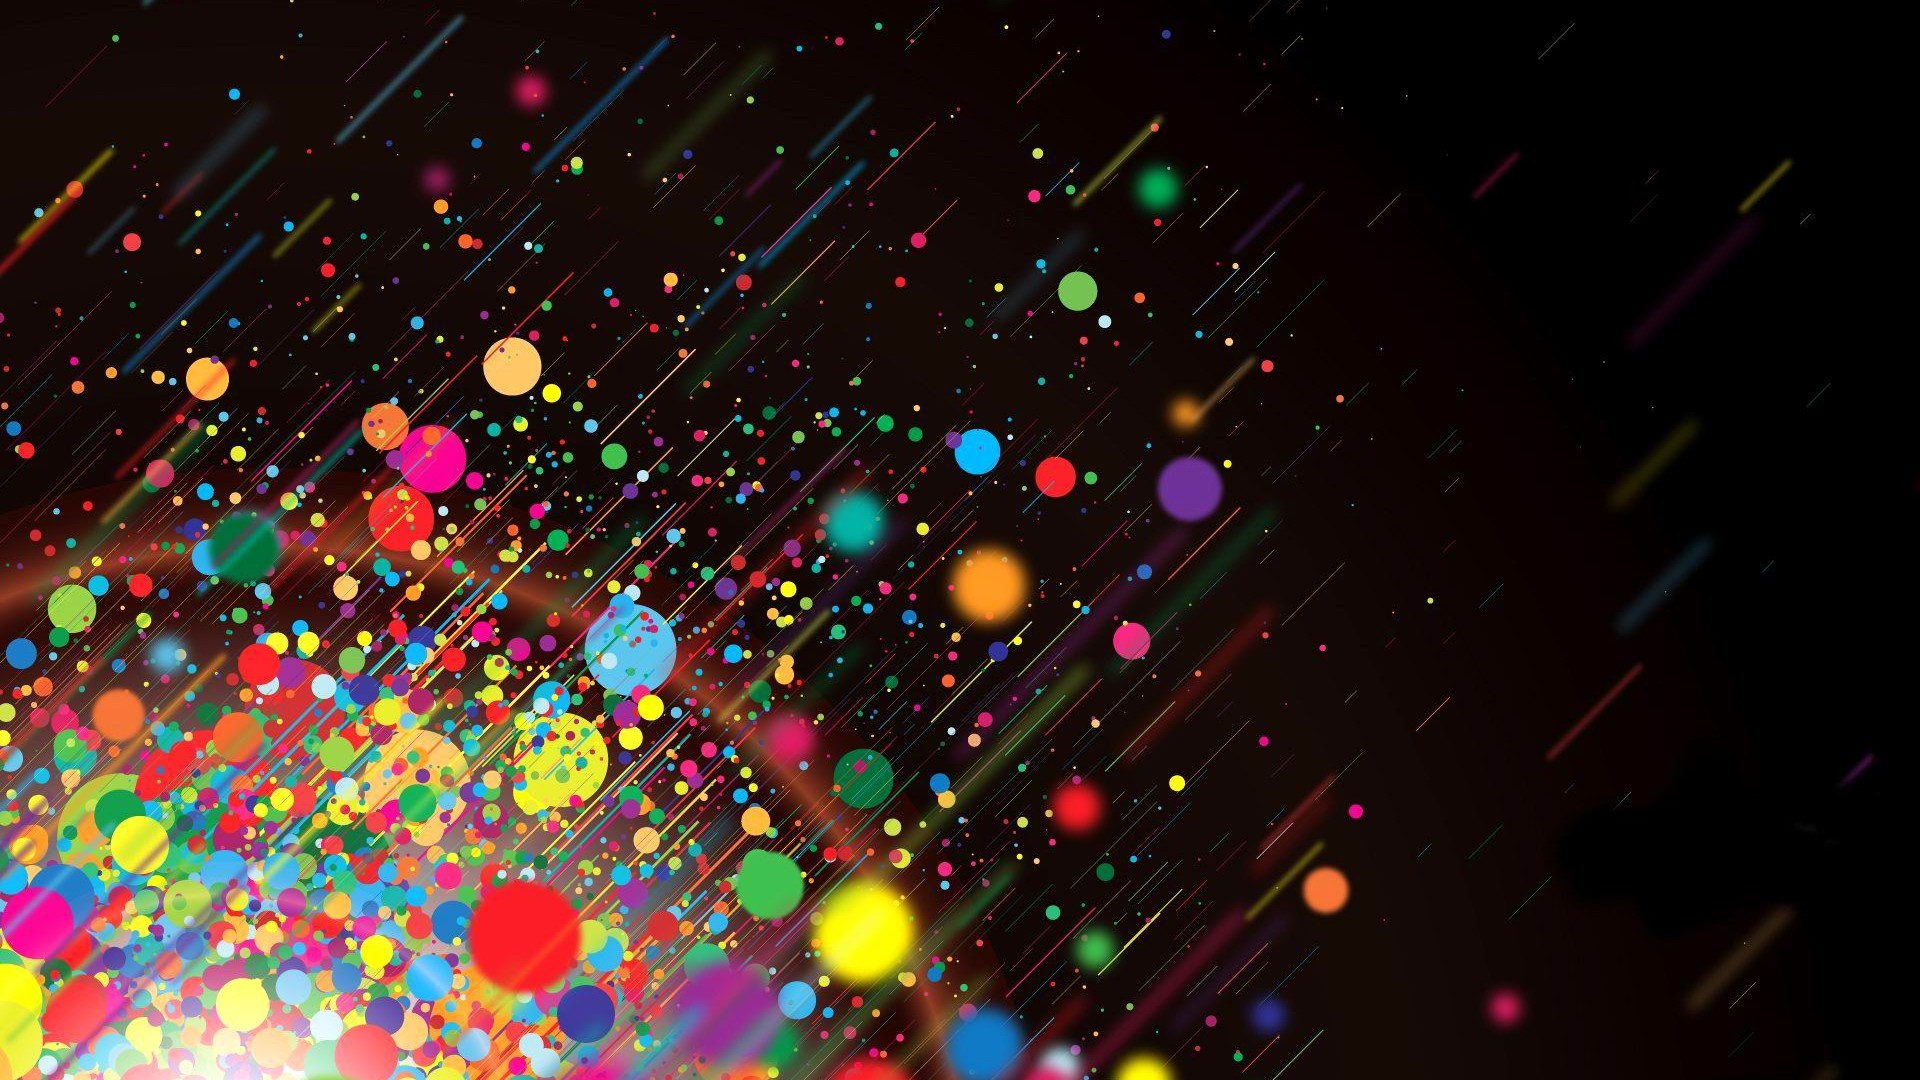 abstract-rainbows-digital-art